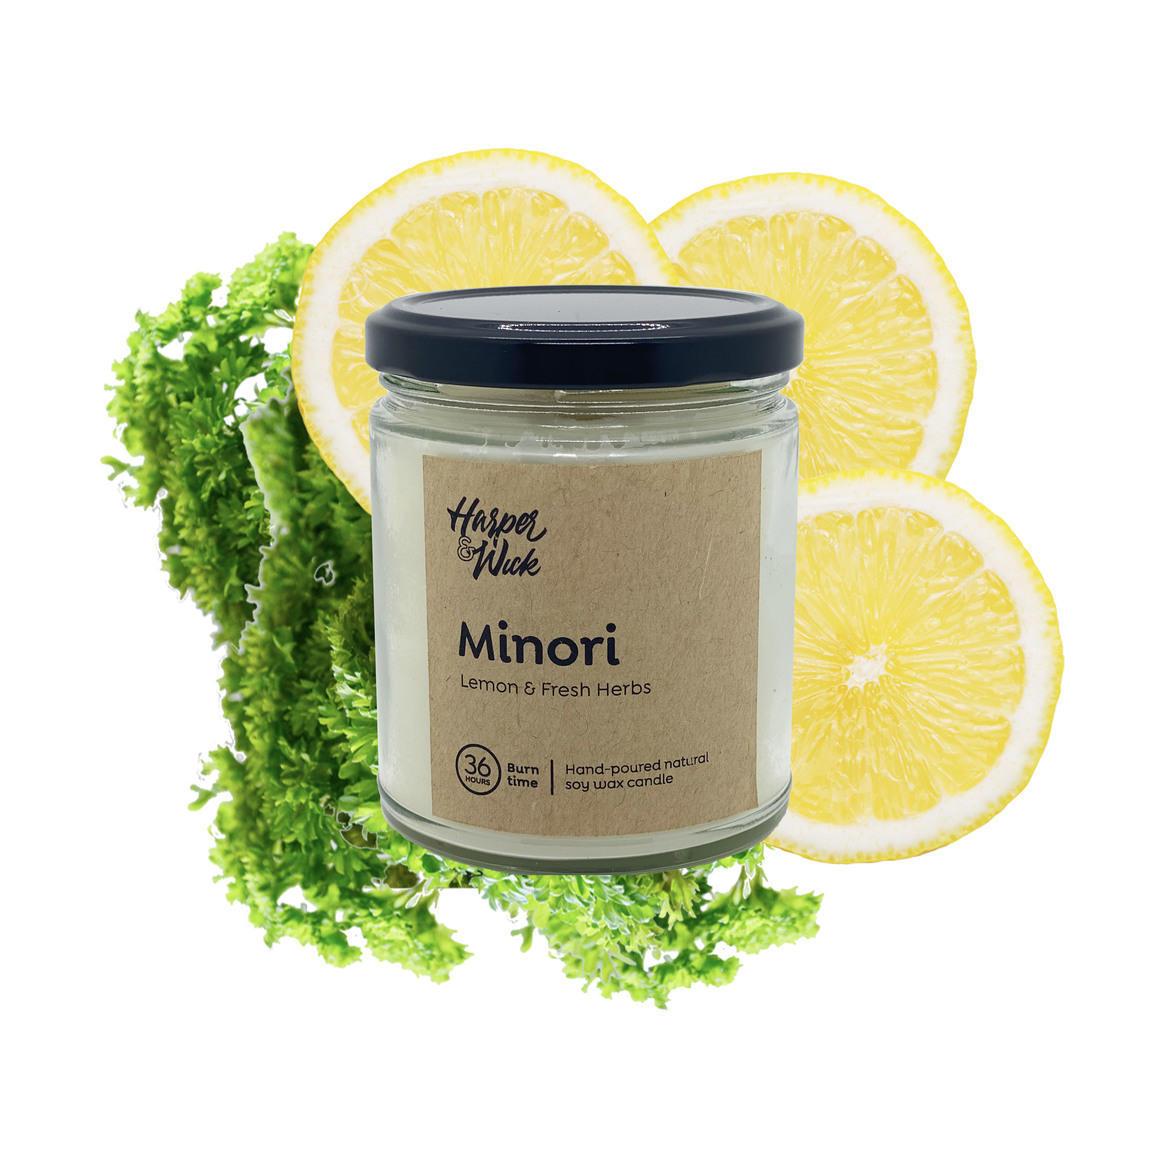 Minori - Lemon & Fresh Herbs | Trada Marketplace